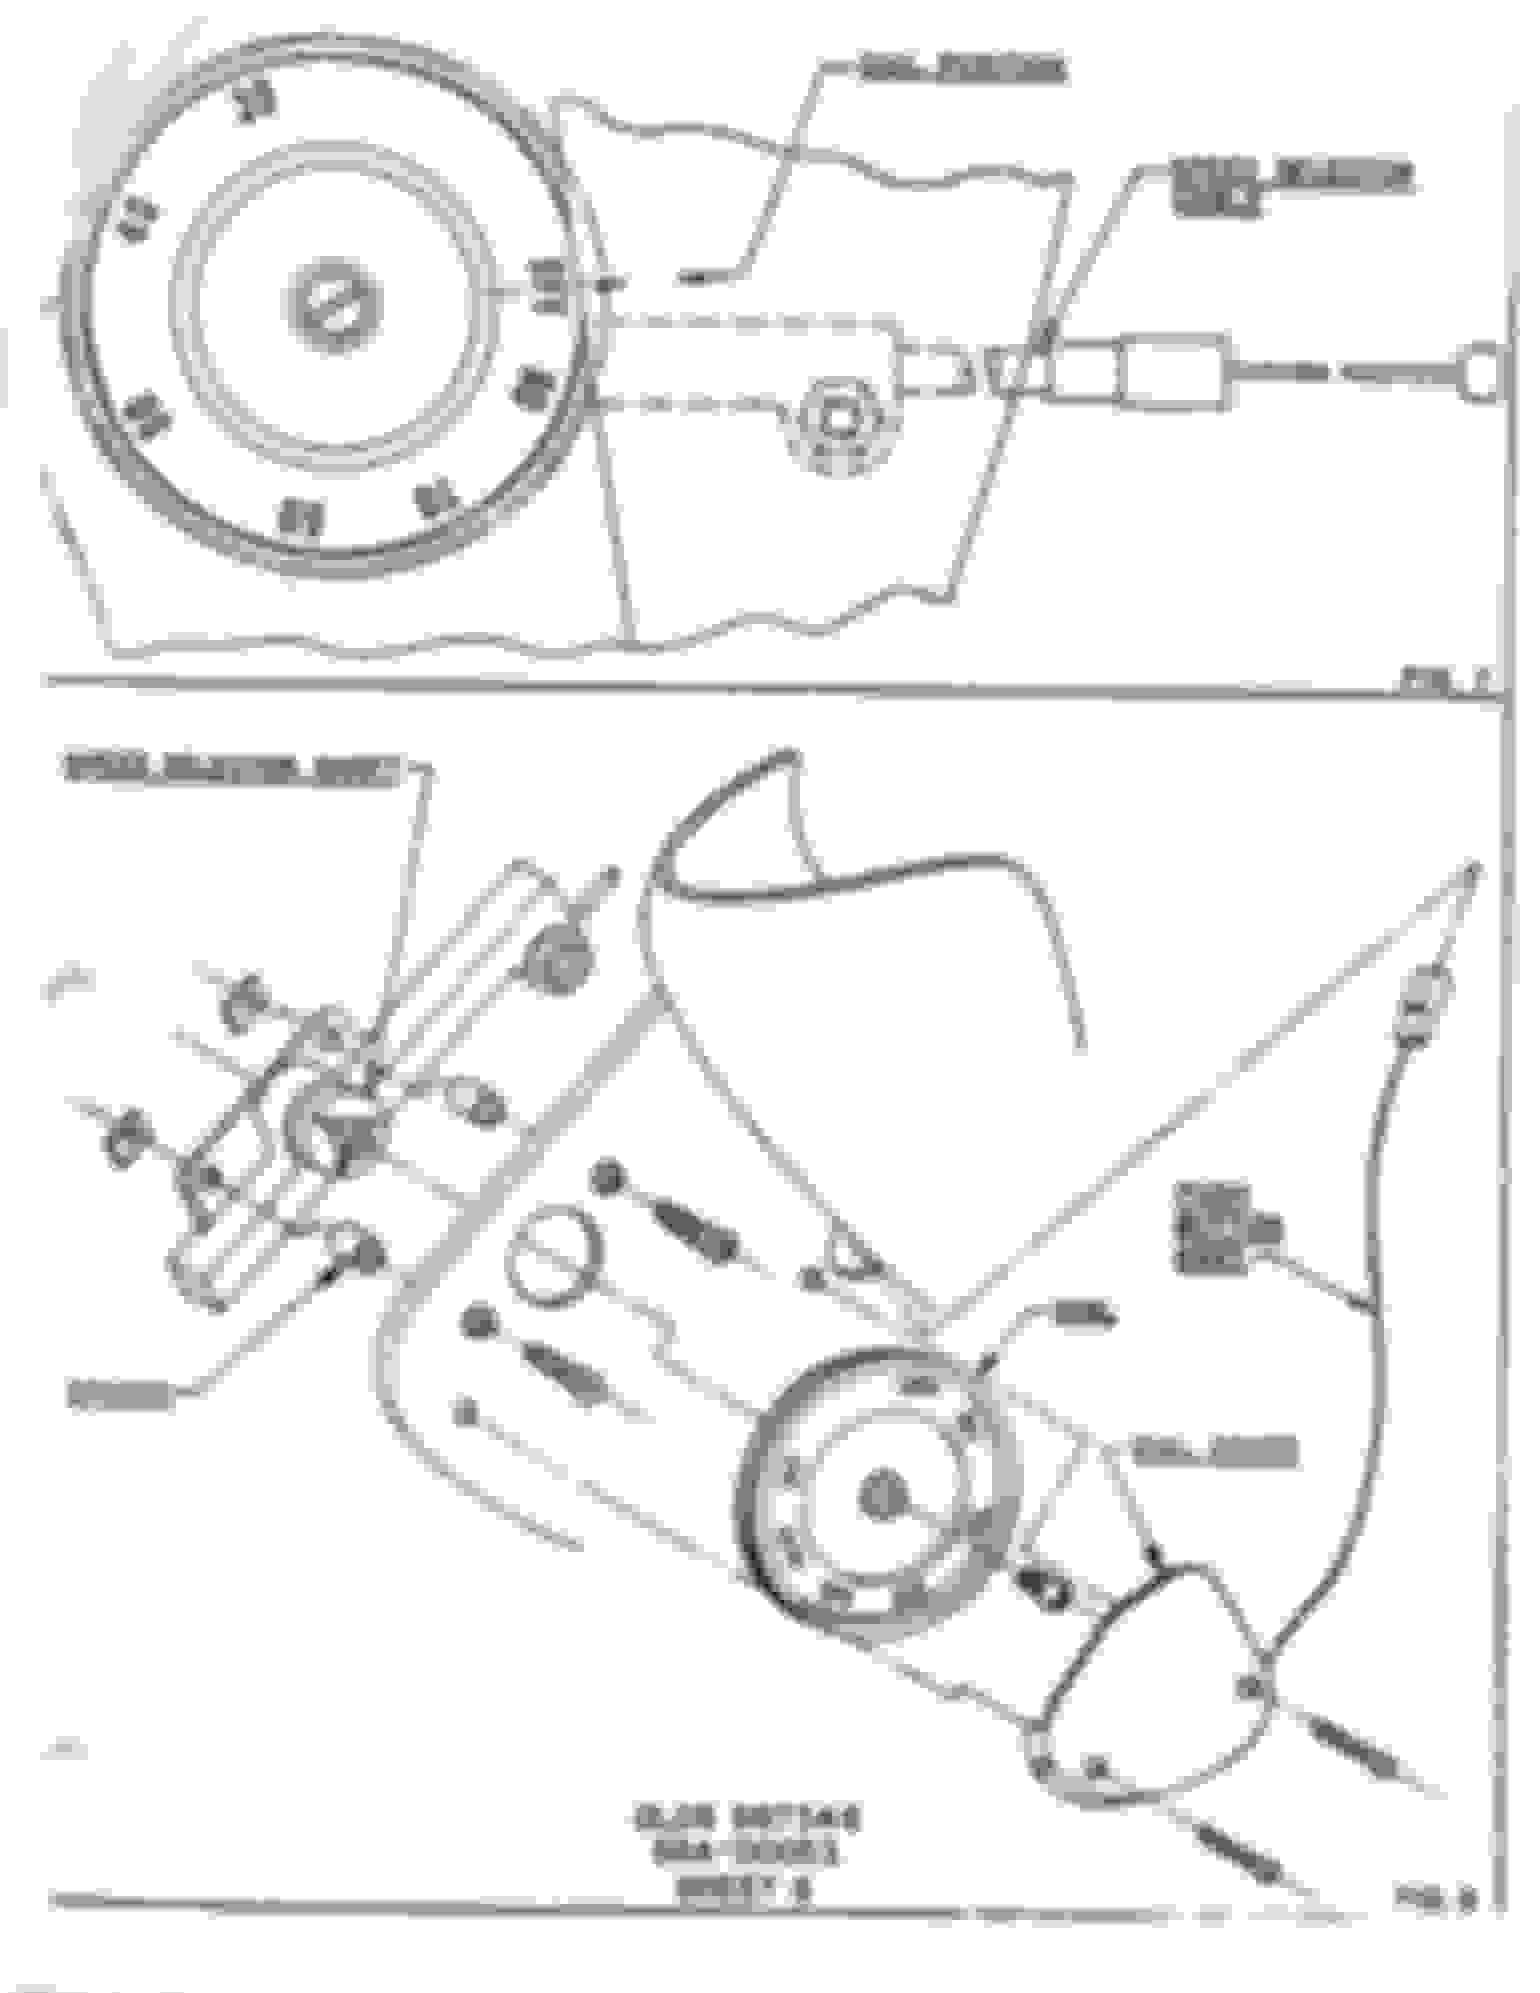 hight resolution of  perfect circle cruise control wiring diagram wiring diagram h8 on bose 321 speaker wiring gm